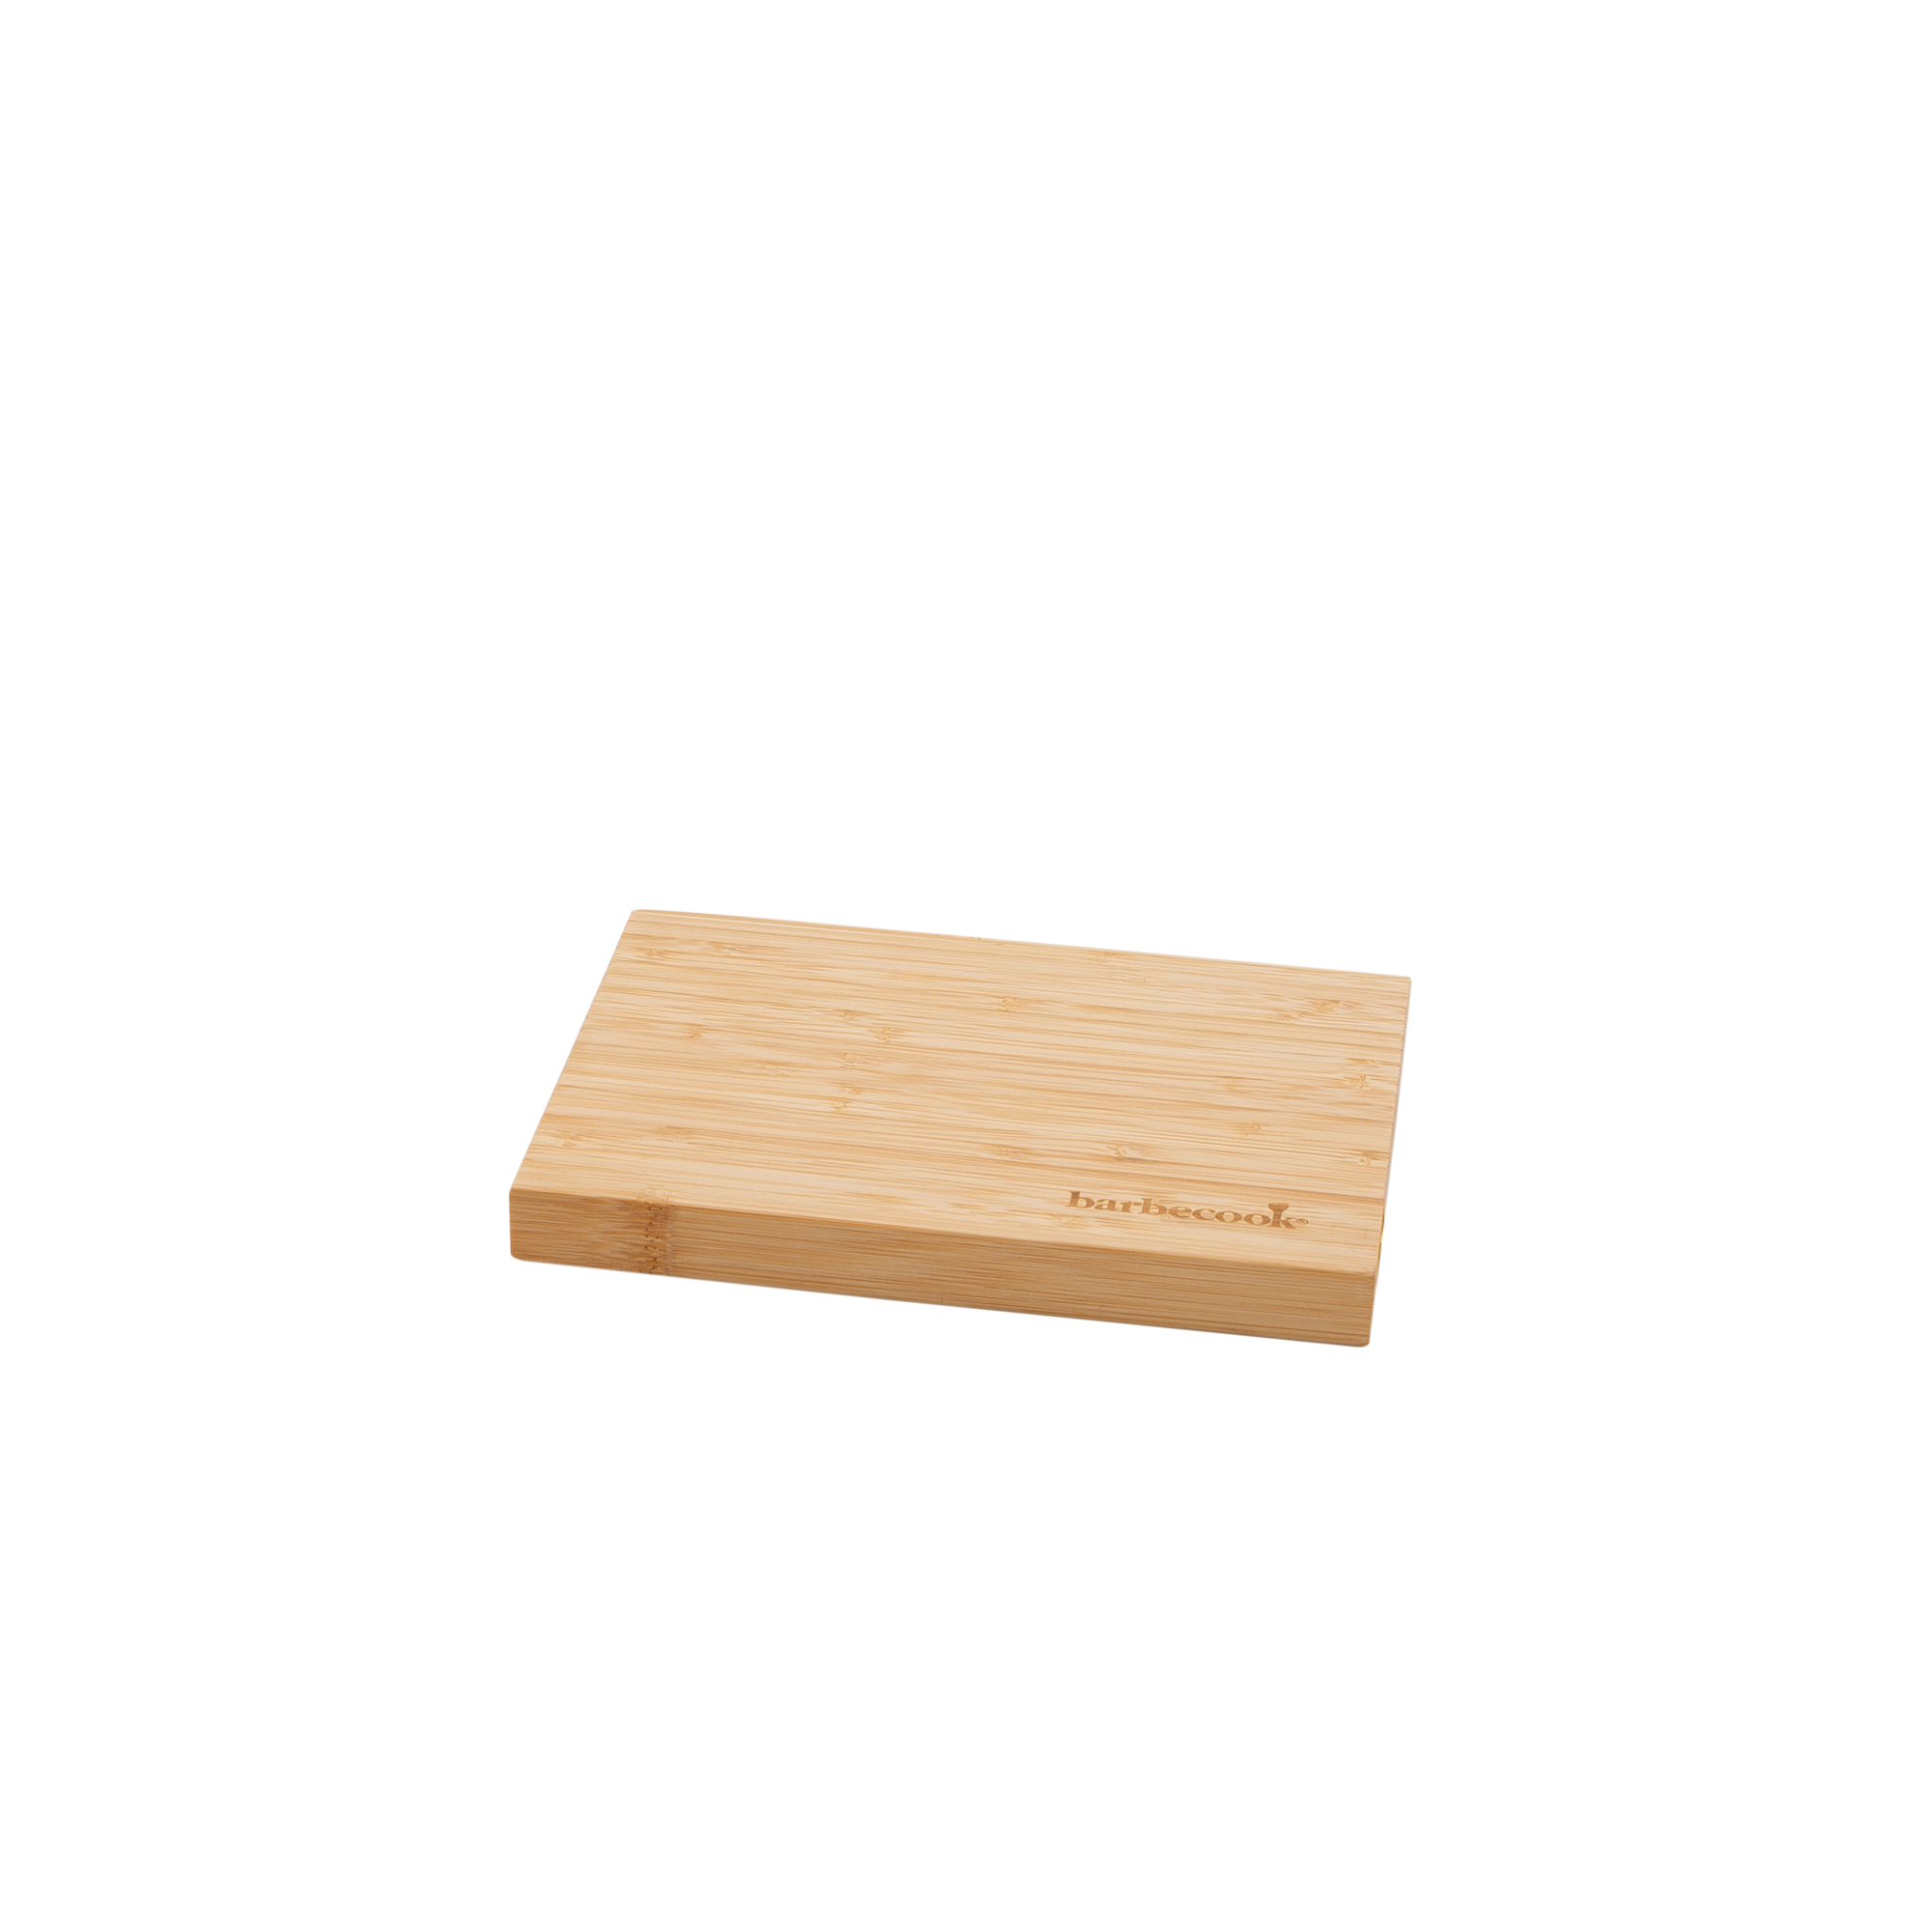 Barbecook bamboo cutting board 20x15x2cm